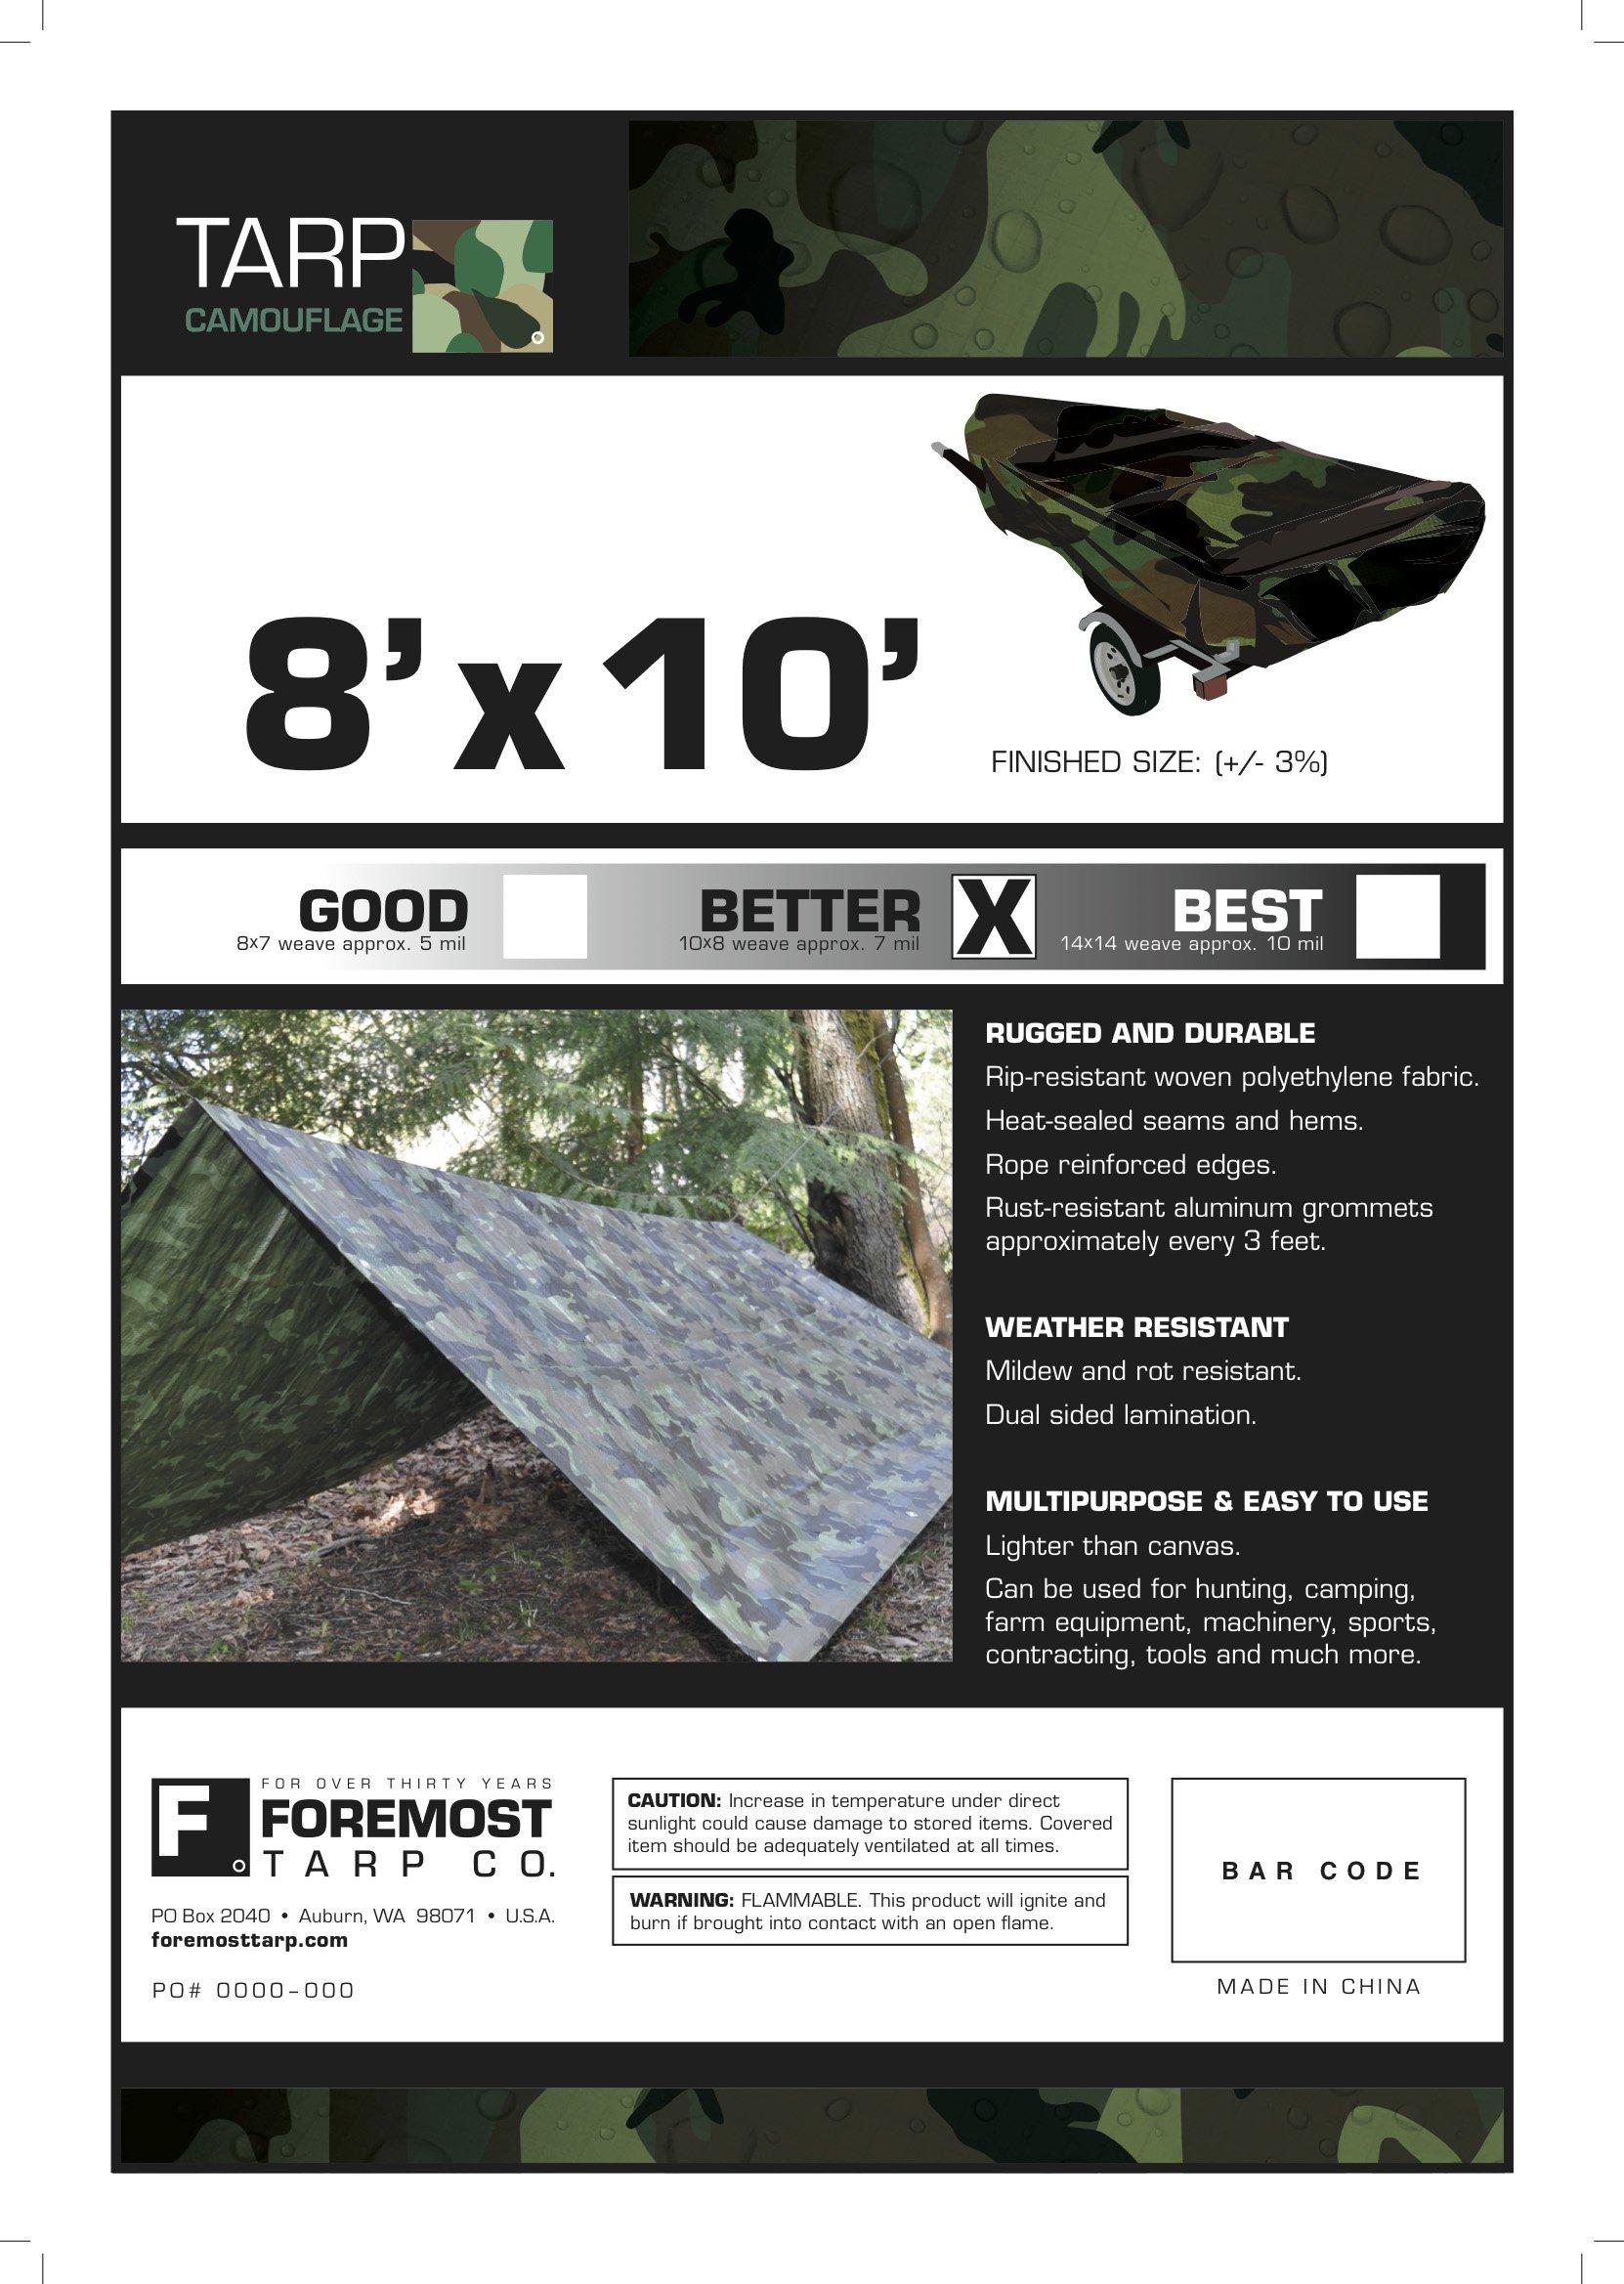 8' x 10' Dry Top Camouflage 7-mil Poly Tarp item #408102